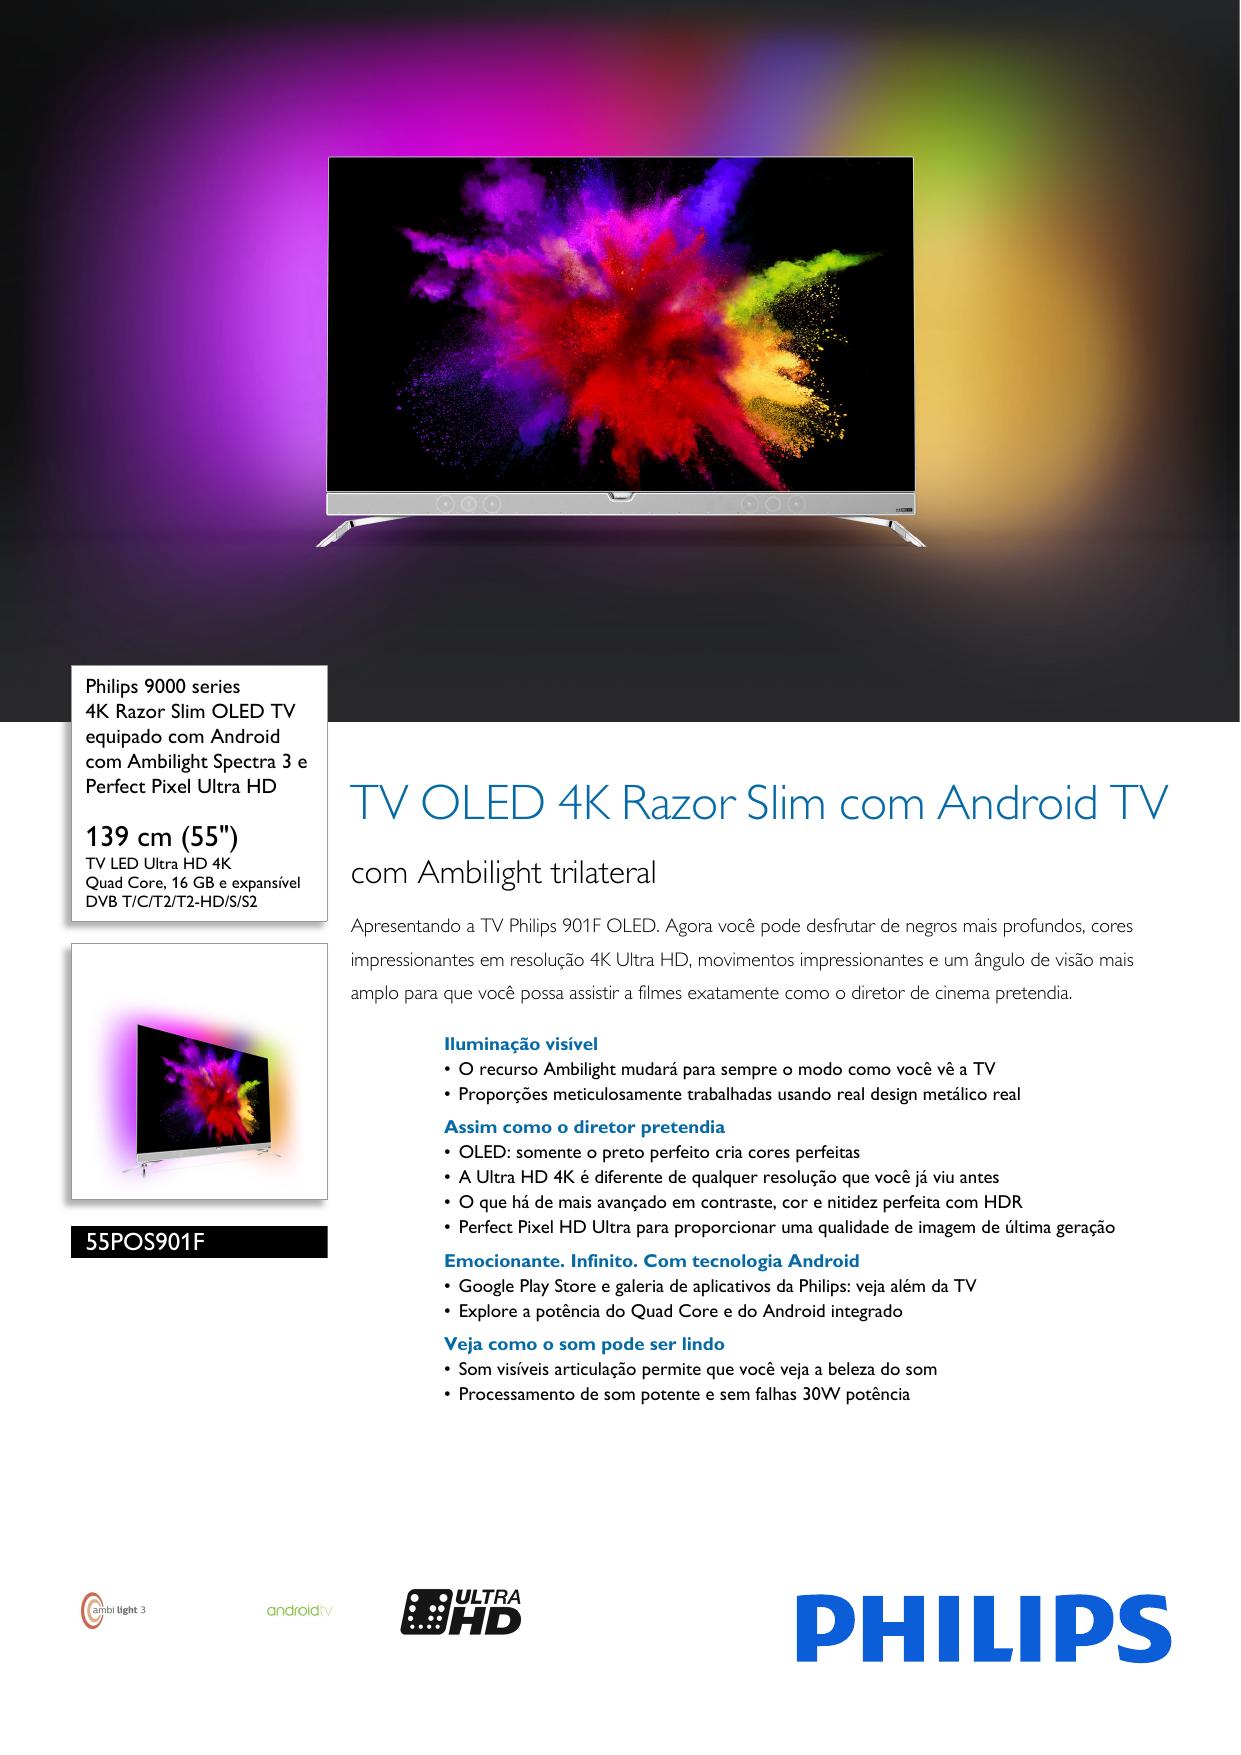 Page 1 of 3 - Philips 55POS901F 12 4K Razor Slim OLED TV Equipado Com 12fccd3096c4